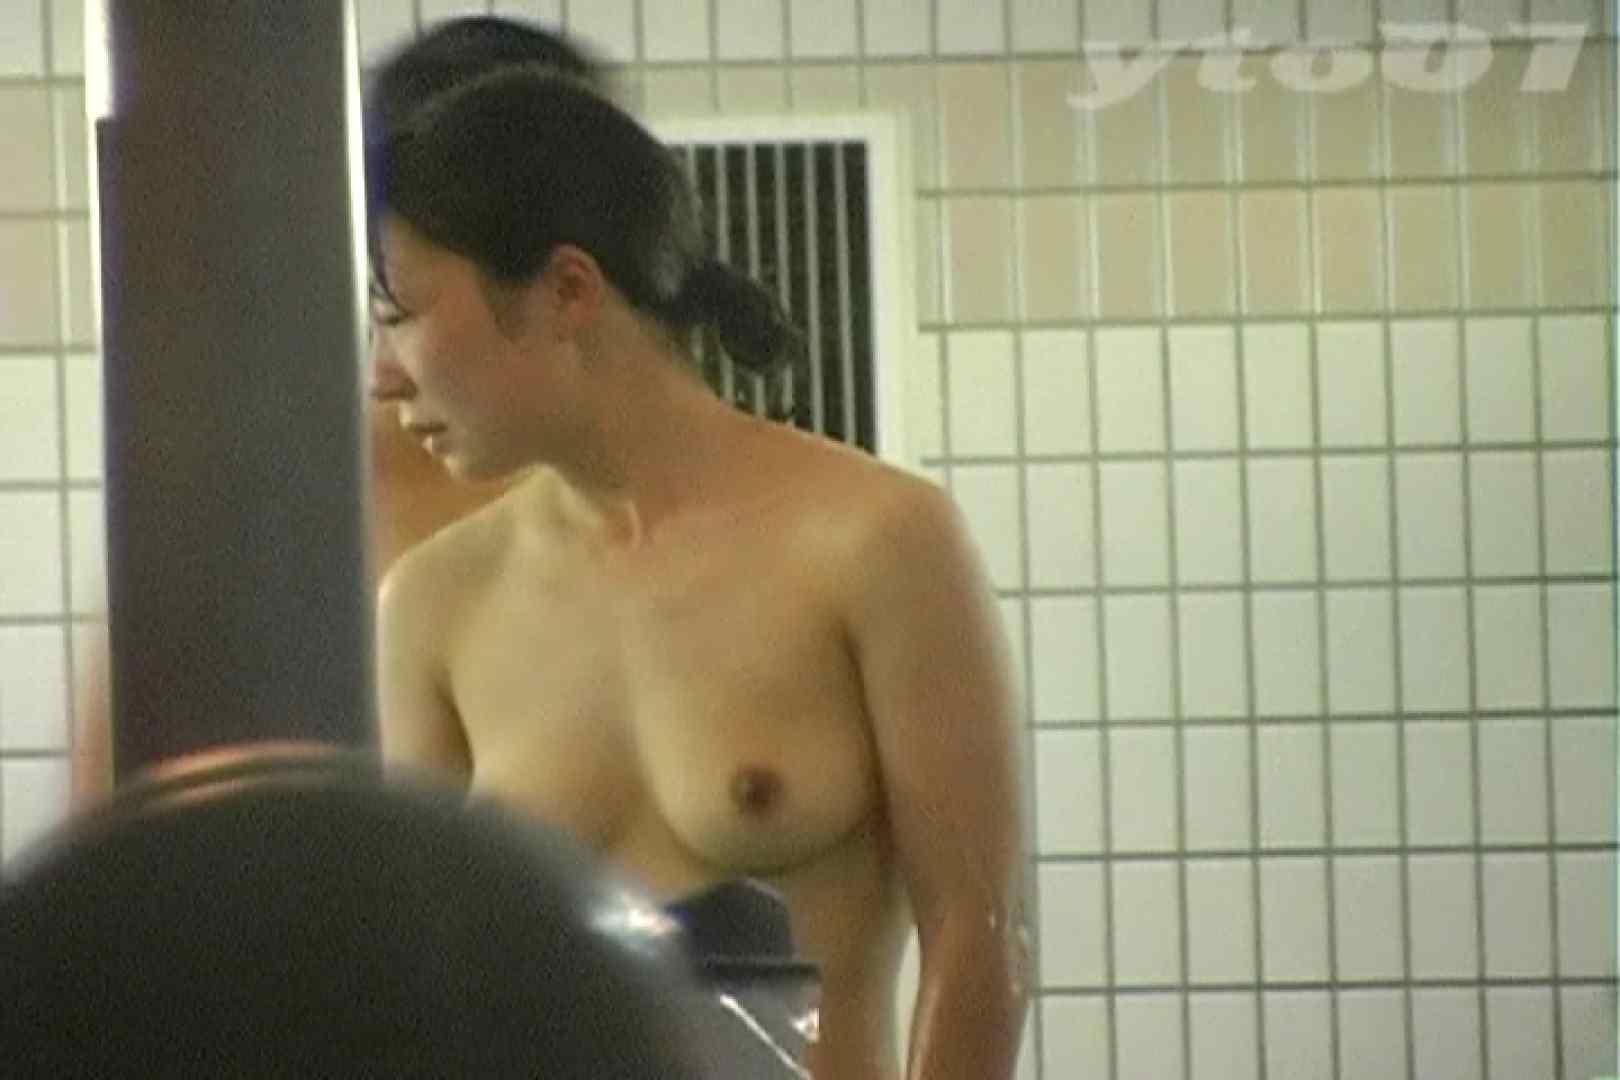 ▲復活限定▲合宿ホテル女風呂盗撮 Vol.07 0 | 0  92画像 18